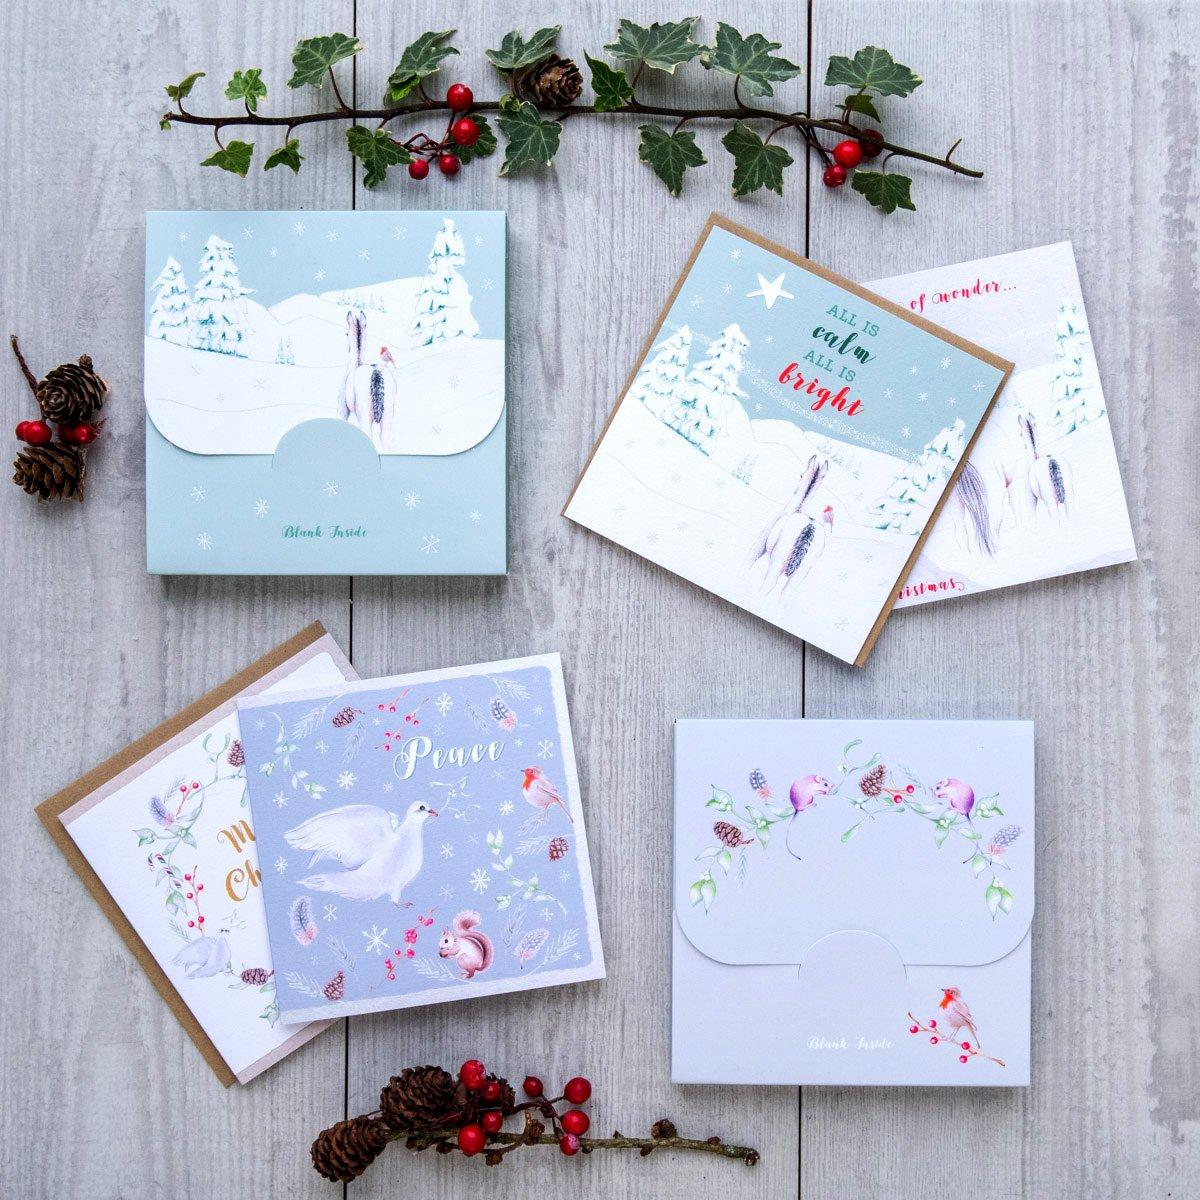 Boxed Christmas sets